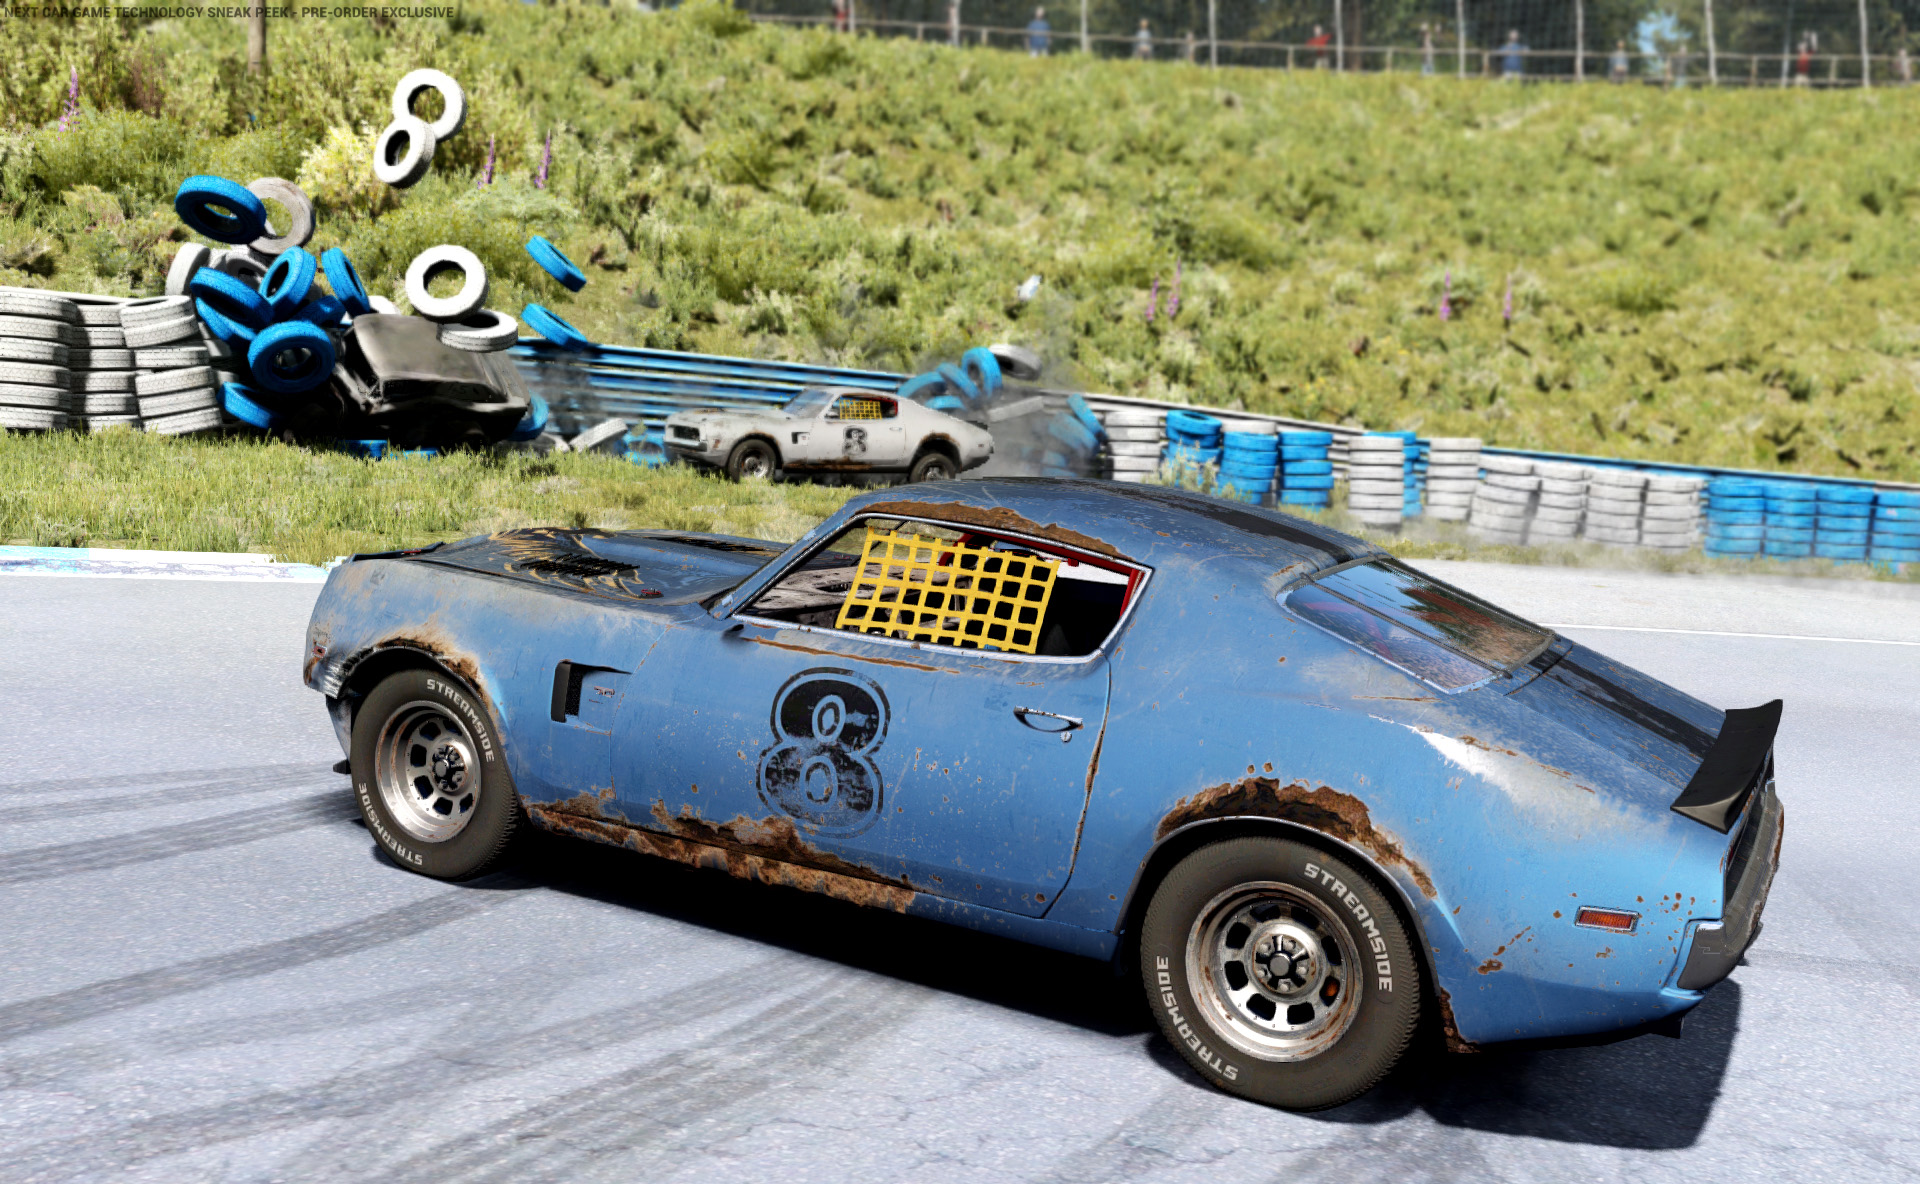 BugBear's Next Car Game Sneak Peek Tech Demo 2.0 adds phyiscs cannon